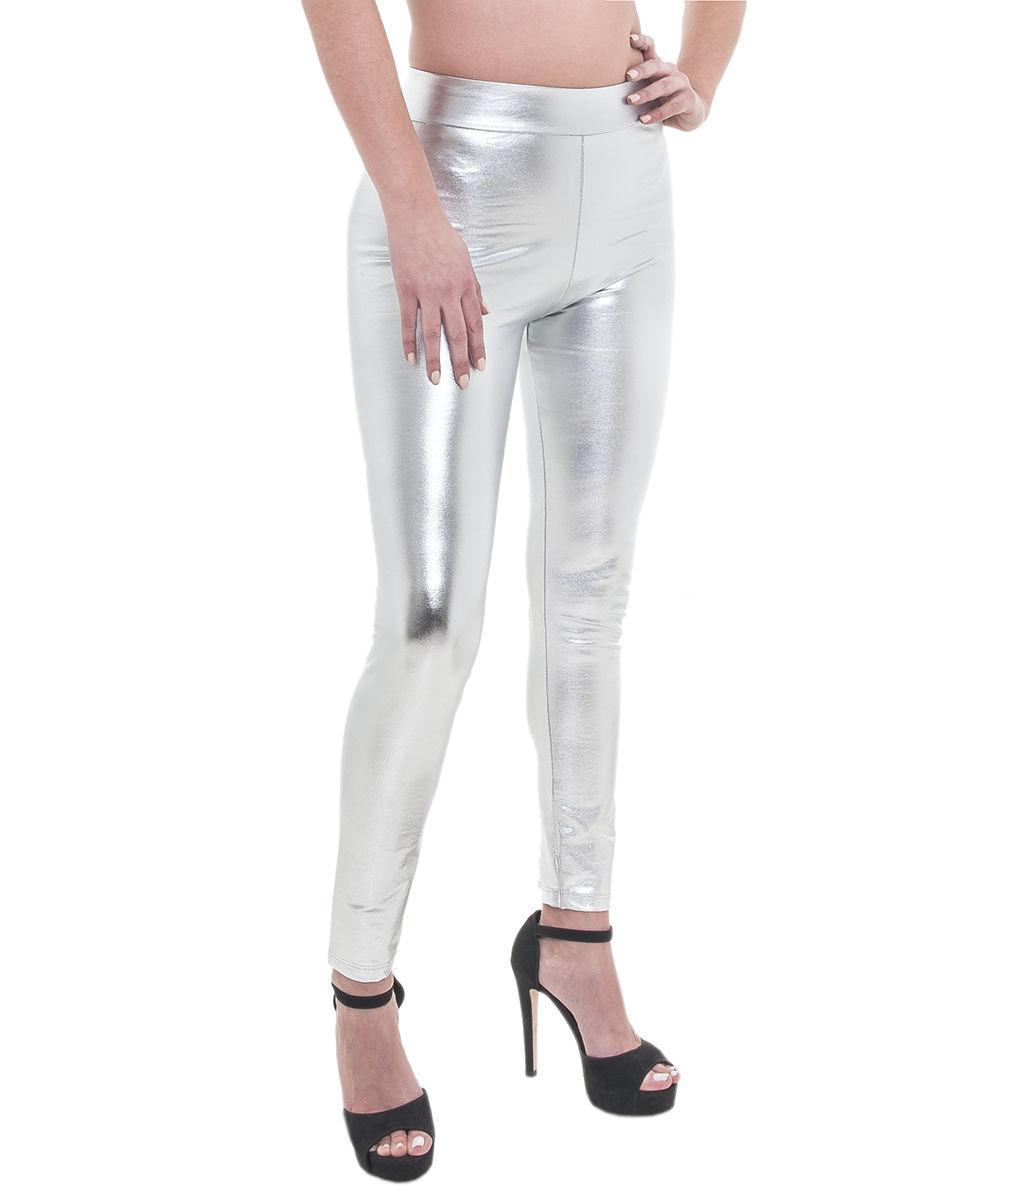 74597d0714af Κολάν γυναικείο σε ασημί χρώμα leather look Lovely Girl - Per mia Donna